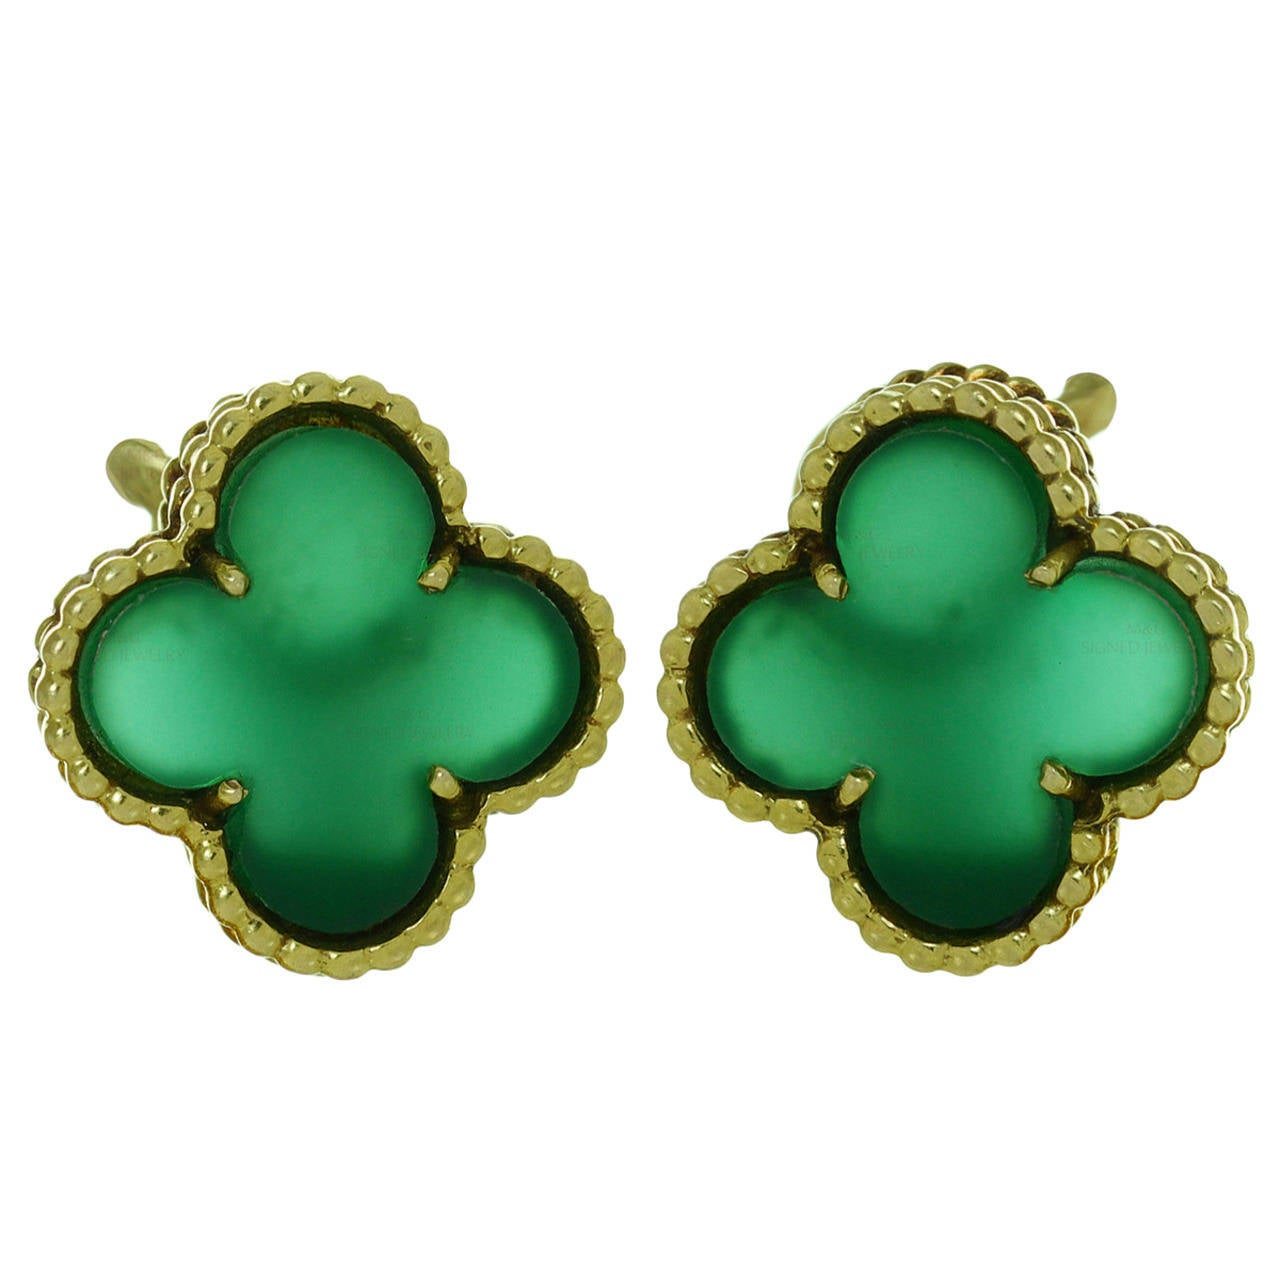 1970s Van Cleef & Arpels Alhambra Green Chalcedony Gold Earrings For Sale